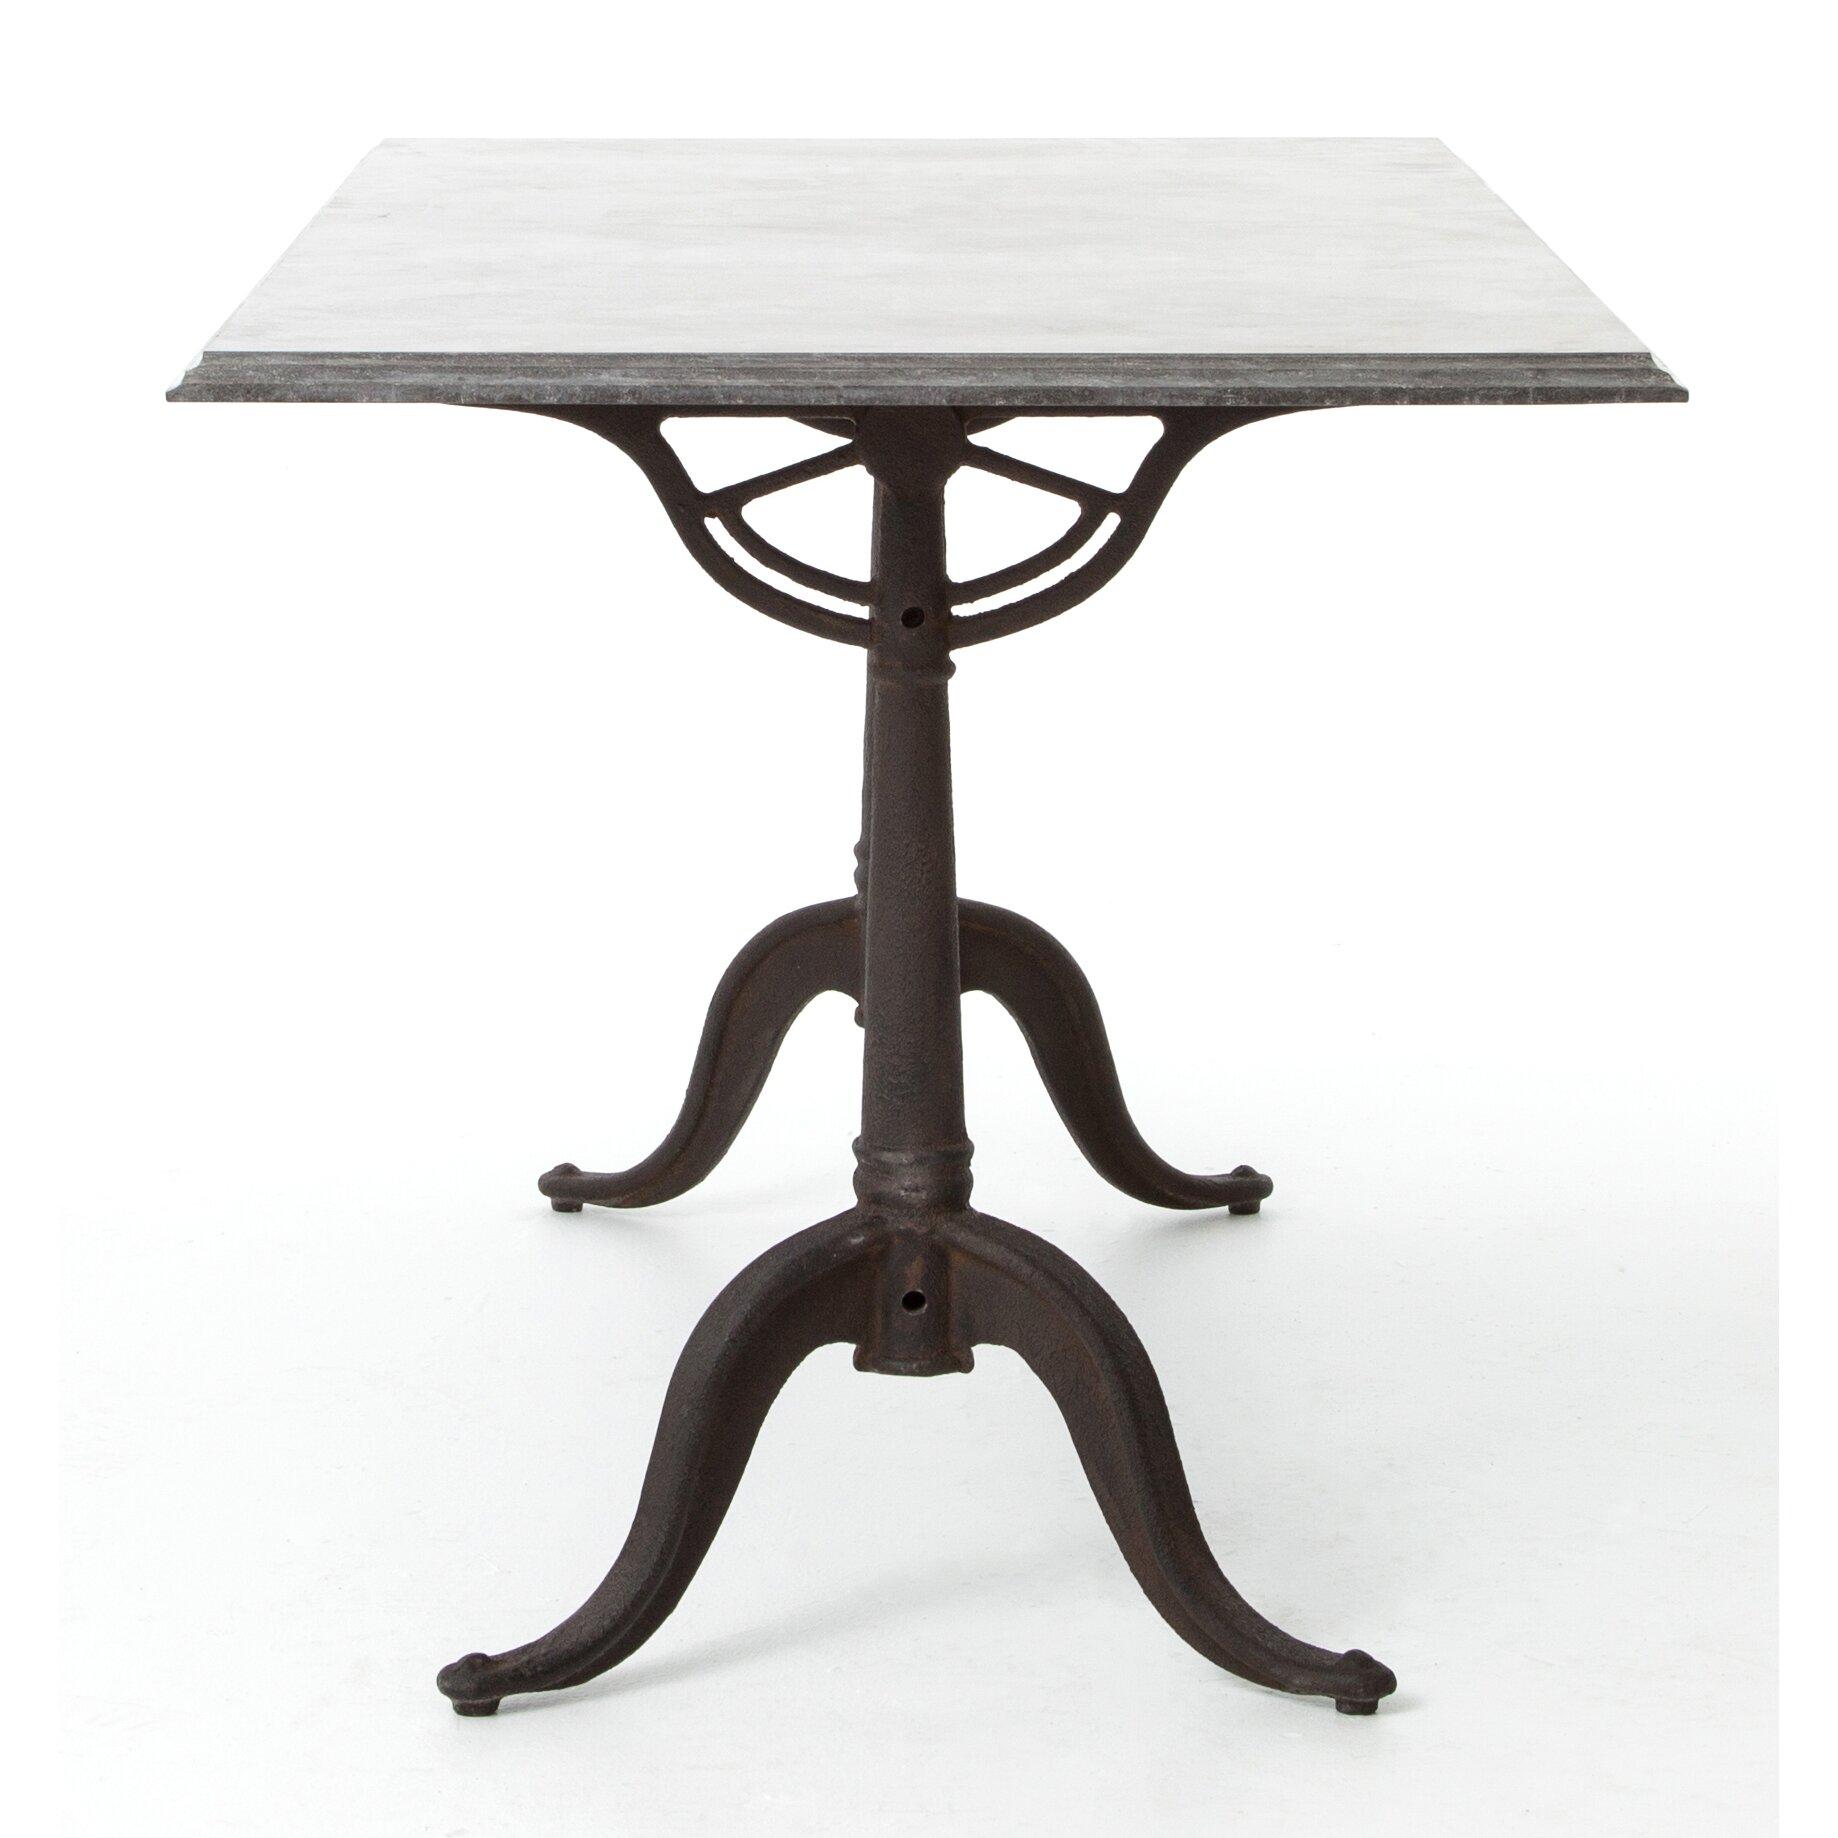 dCOR design Parisian Dining Table amp Reviews Wayfair : Parisian Dining Table Bluestone CIMP 4K from www.wayfair.com size 1838 x 1838 jpeg 282kB